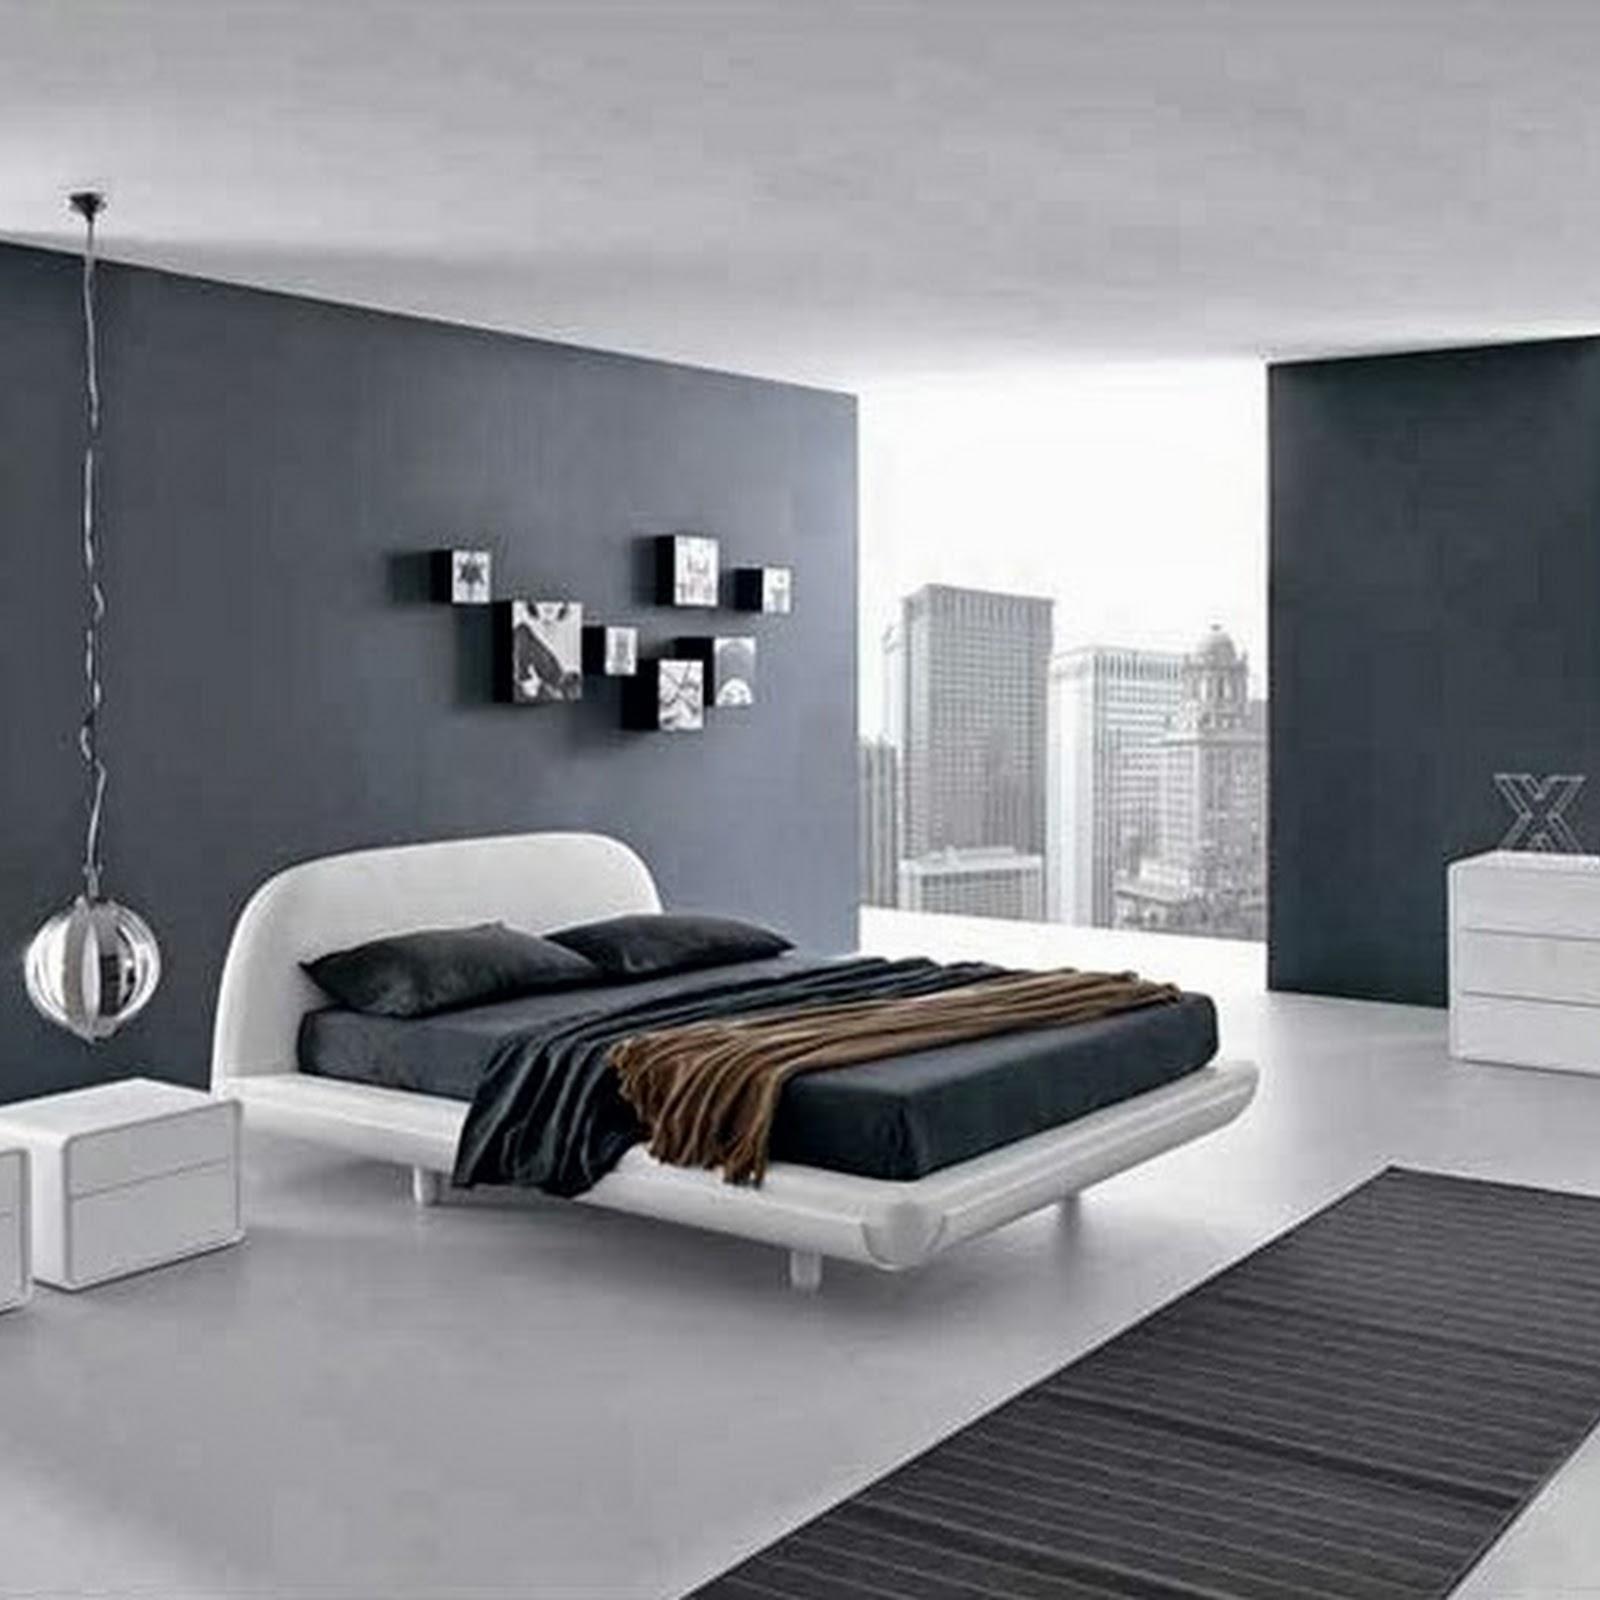 Free Download Paint Ideas For Bedroom Colour Combinations Bedroom Paint Combinations 1600x1600 For Your Desktop Mobile Tablet Explore 34 Wallpaper And Paint Combination Ideas Wallpaper Designs For Office Ideas